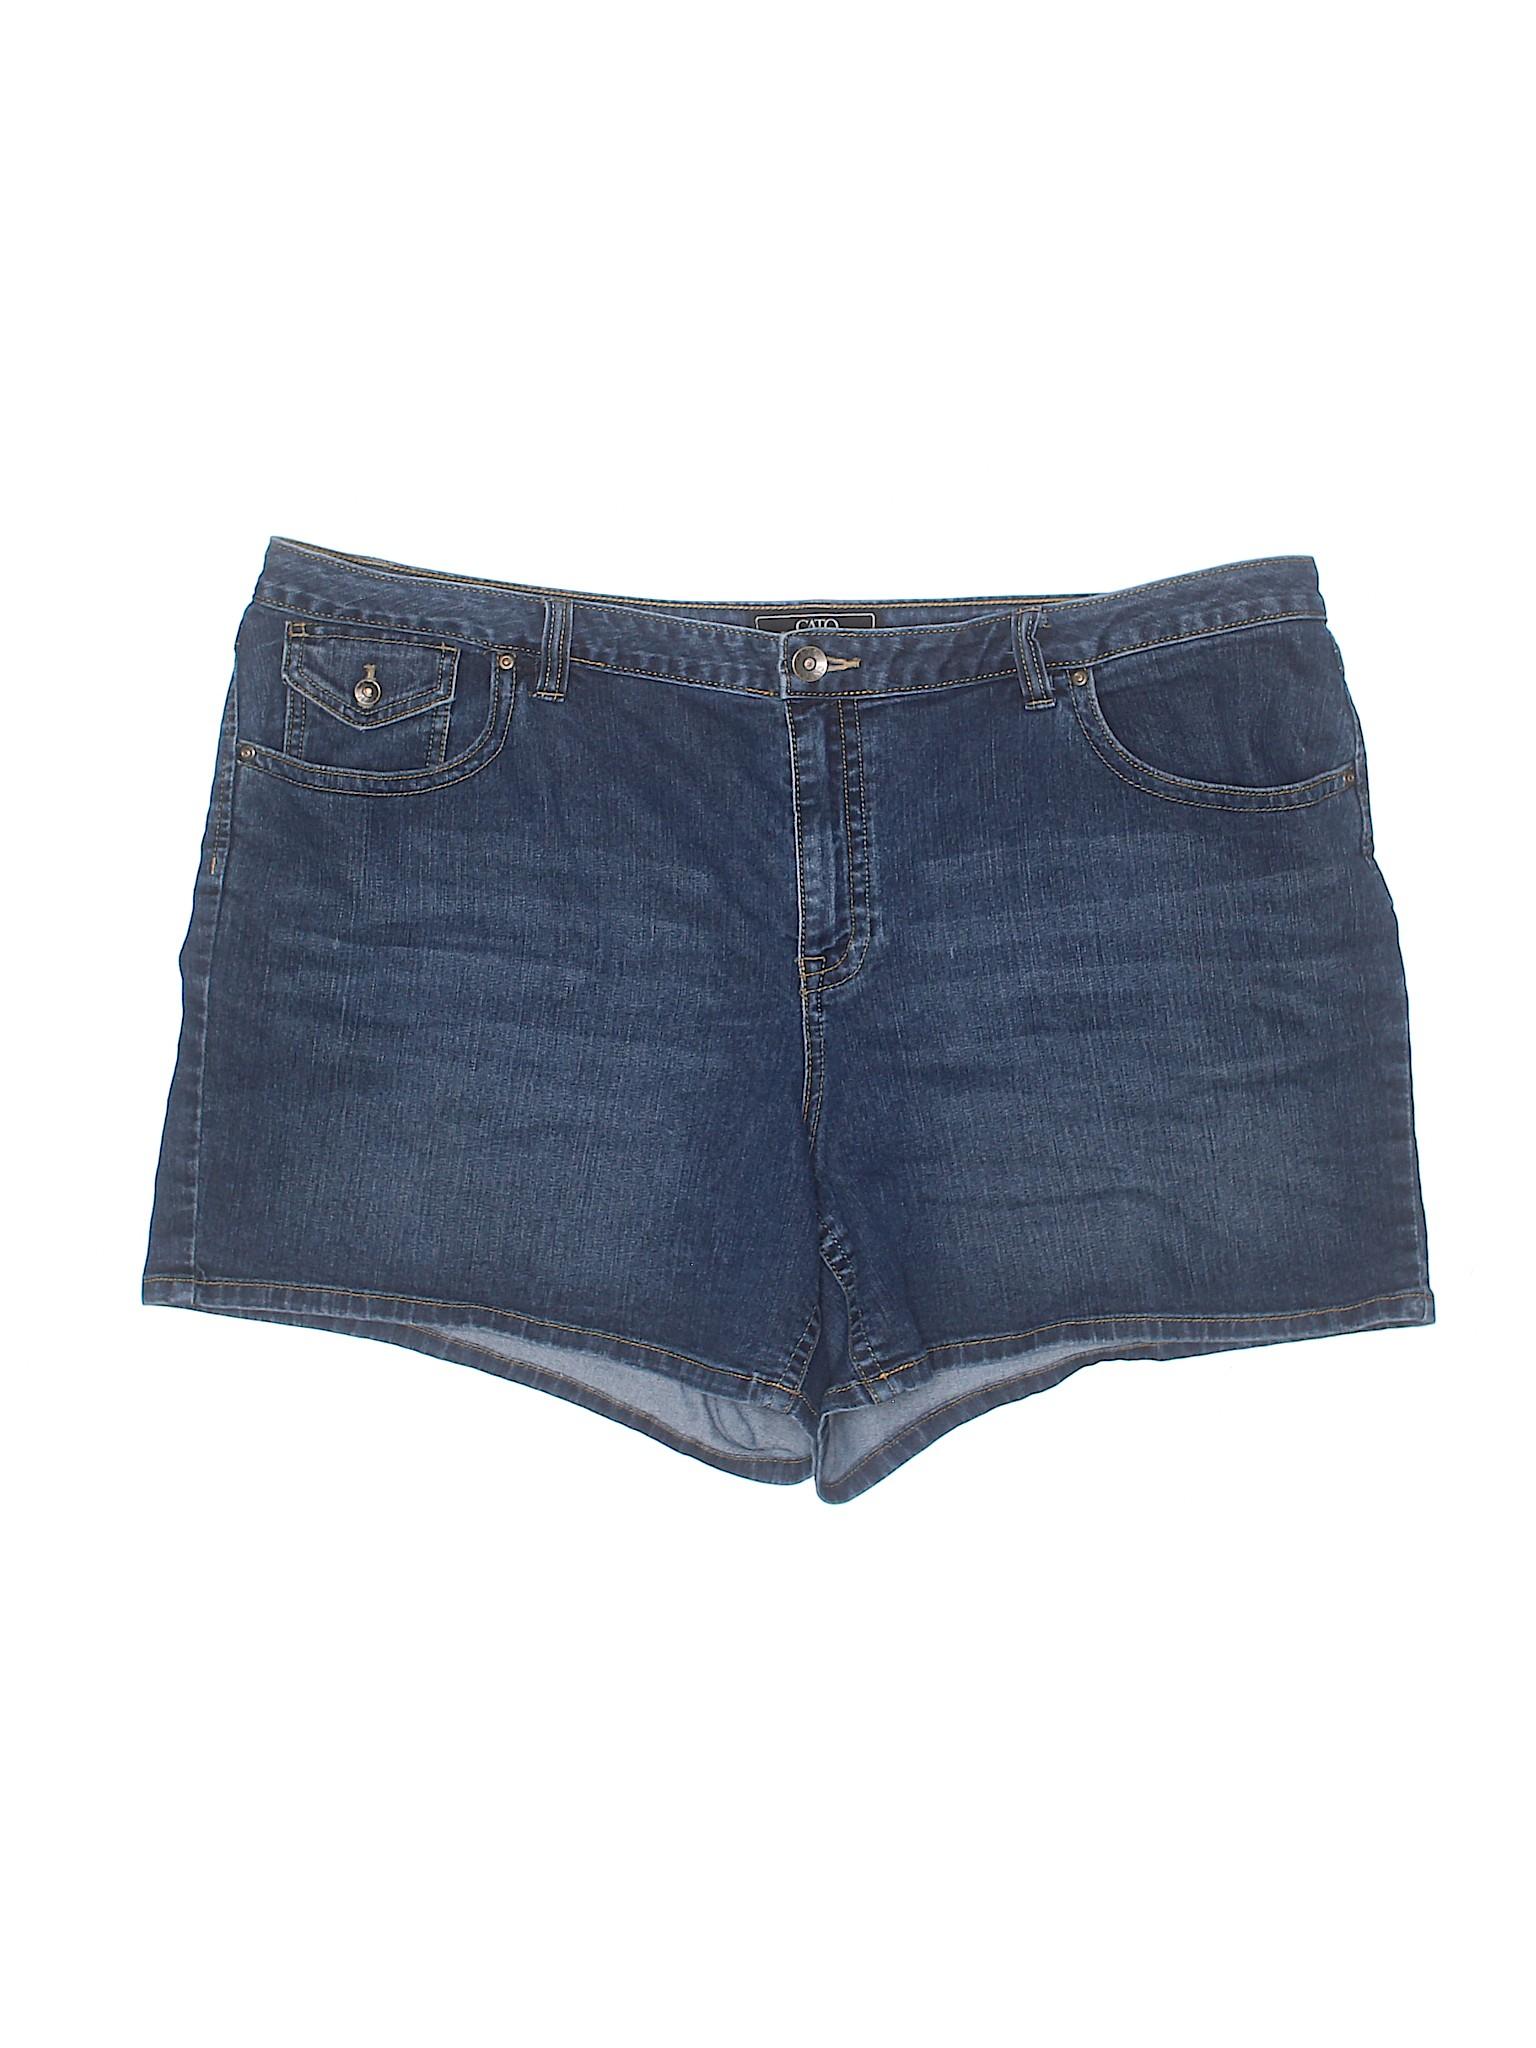 Shorts Denim Denim Cato Boutique Boutique Boutique Cato Cato Denim Boutique Shorts Shorts Cato Denim aqxqOZ